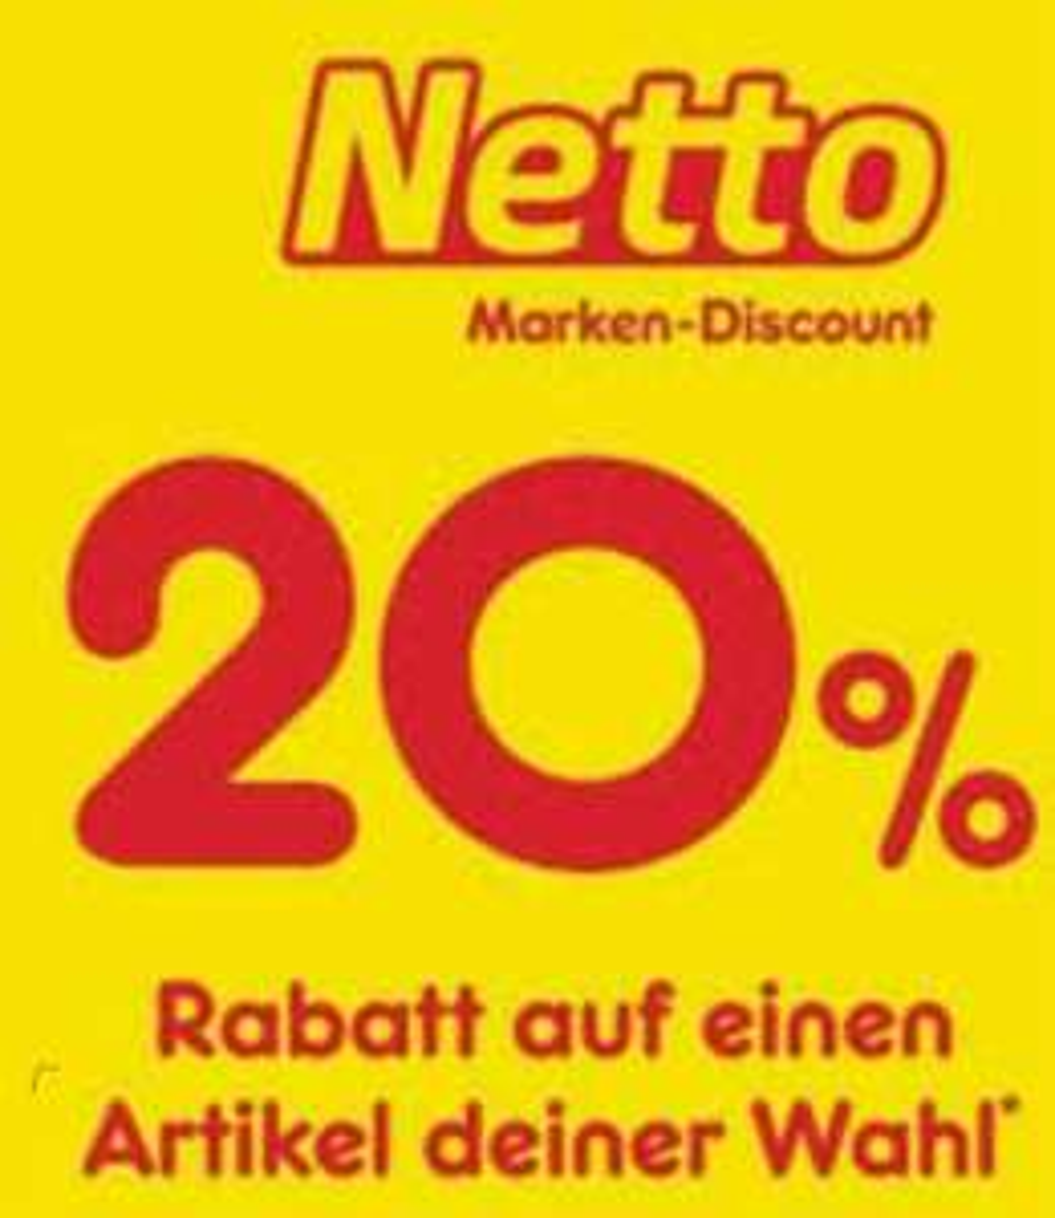 [Netto MD] Rabatt Coupons KW51 (14.12. - 19.12.), bundesweit einsetzbar